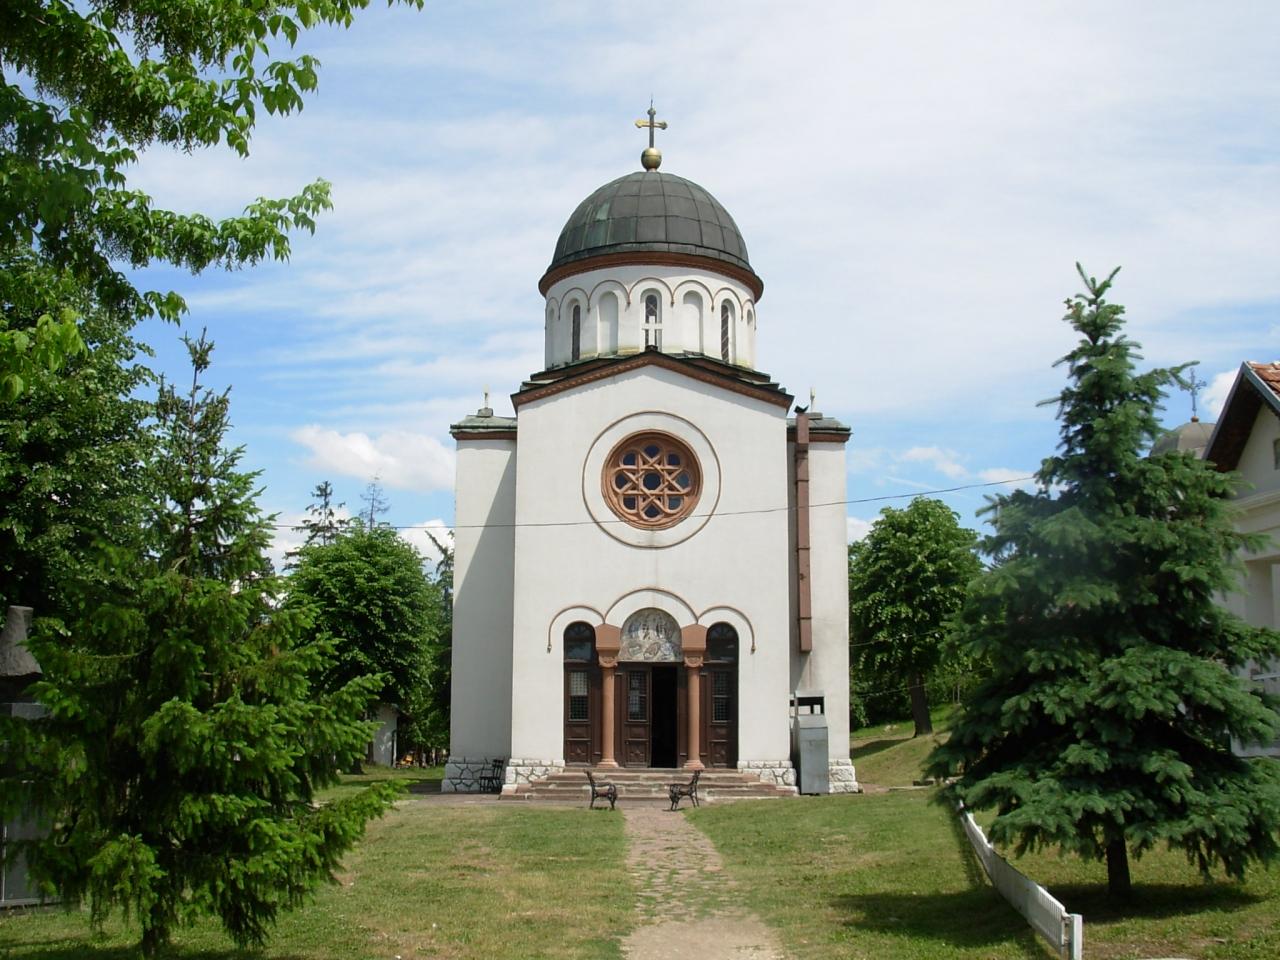 Crkva svetog preobrazenja